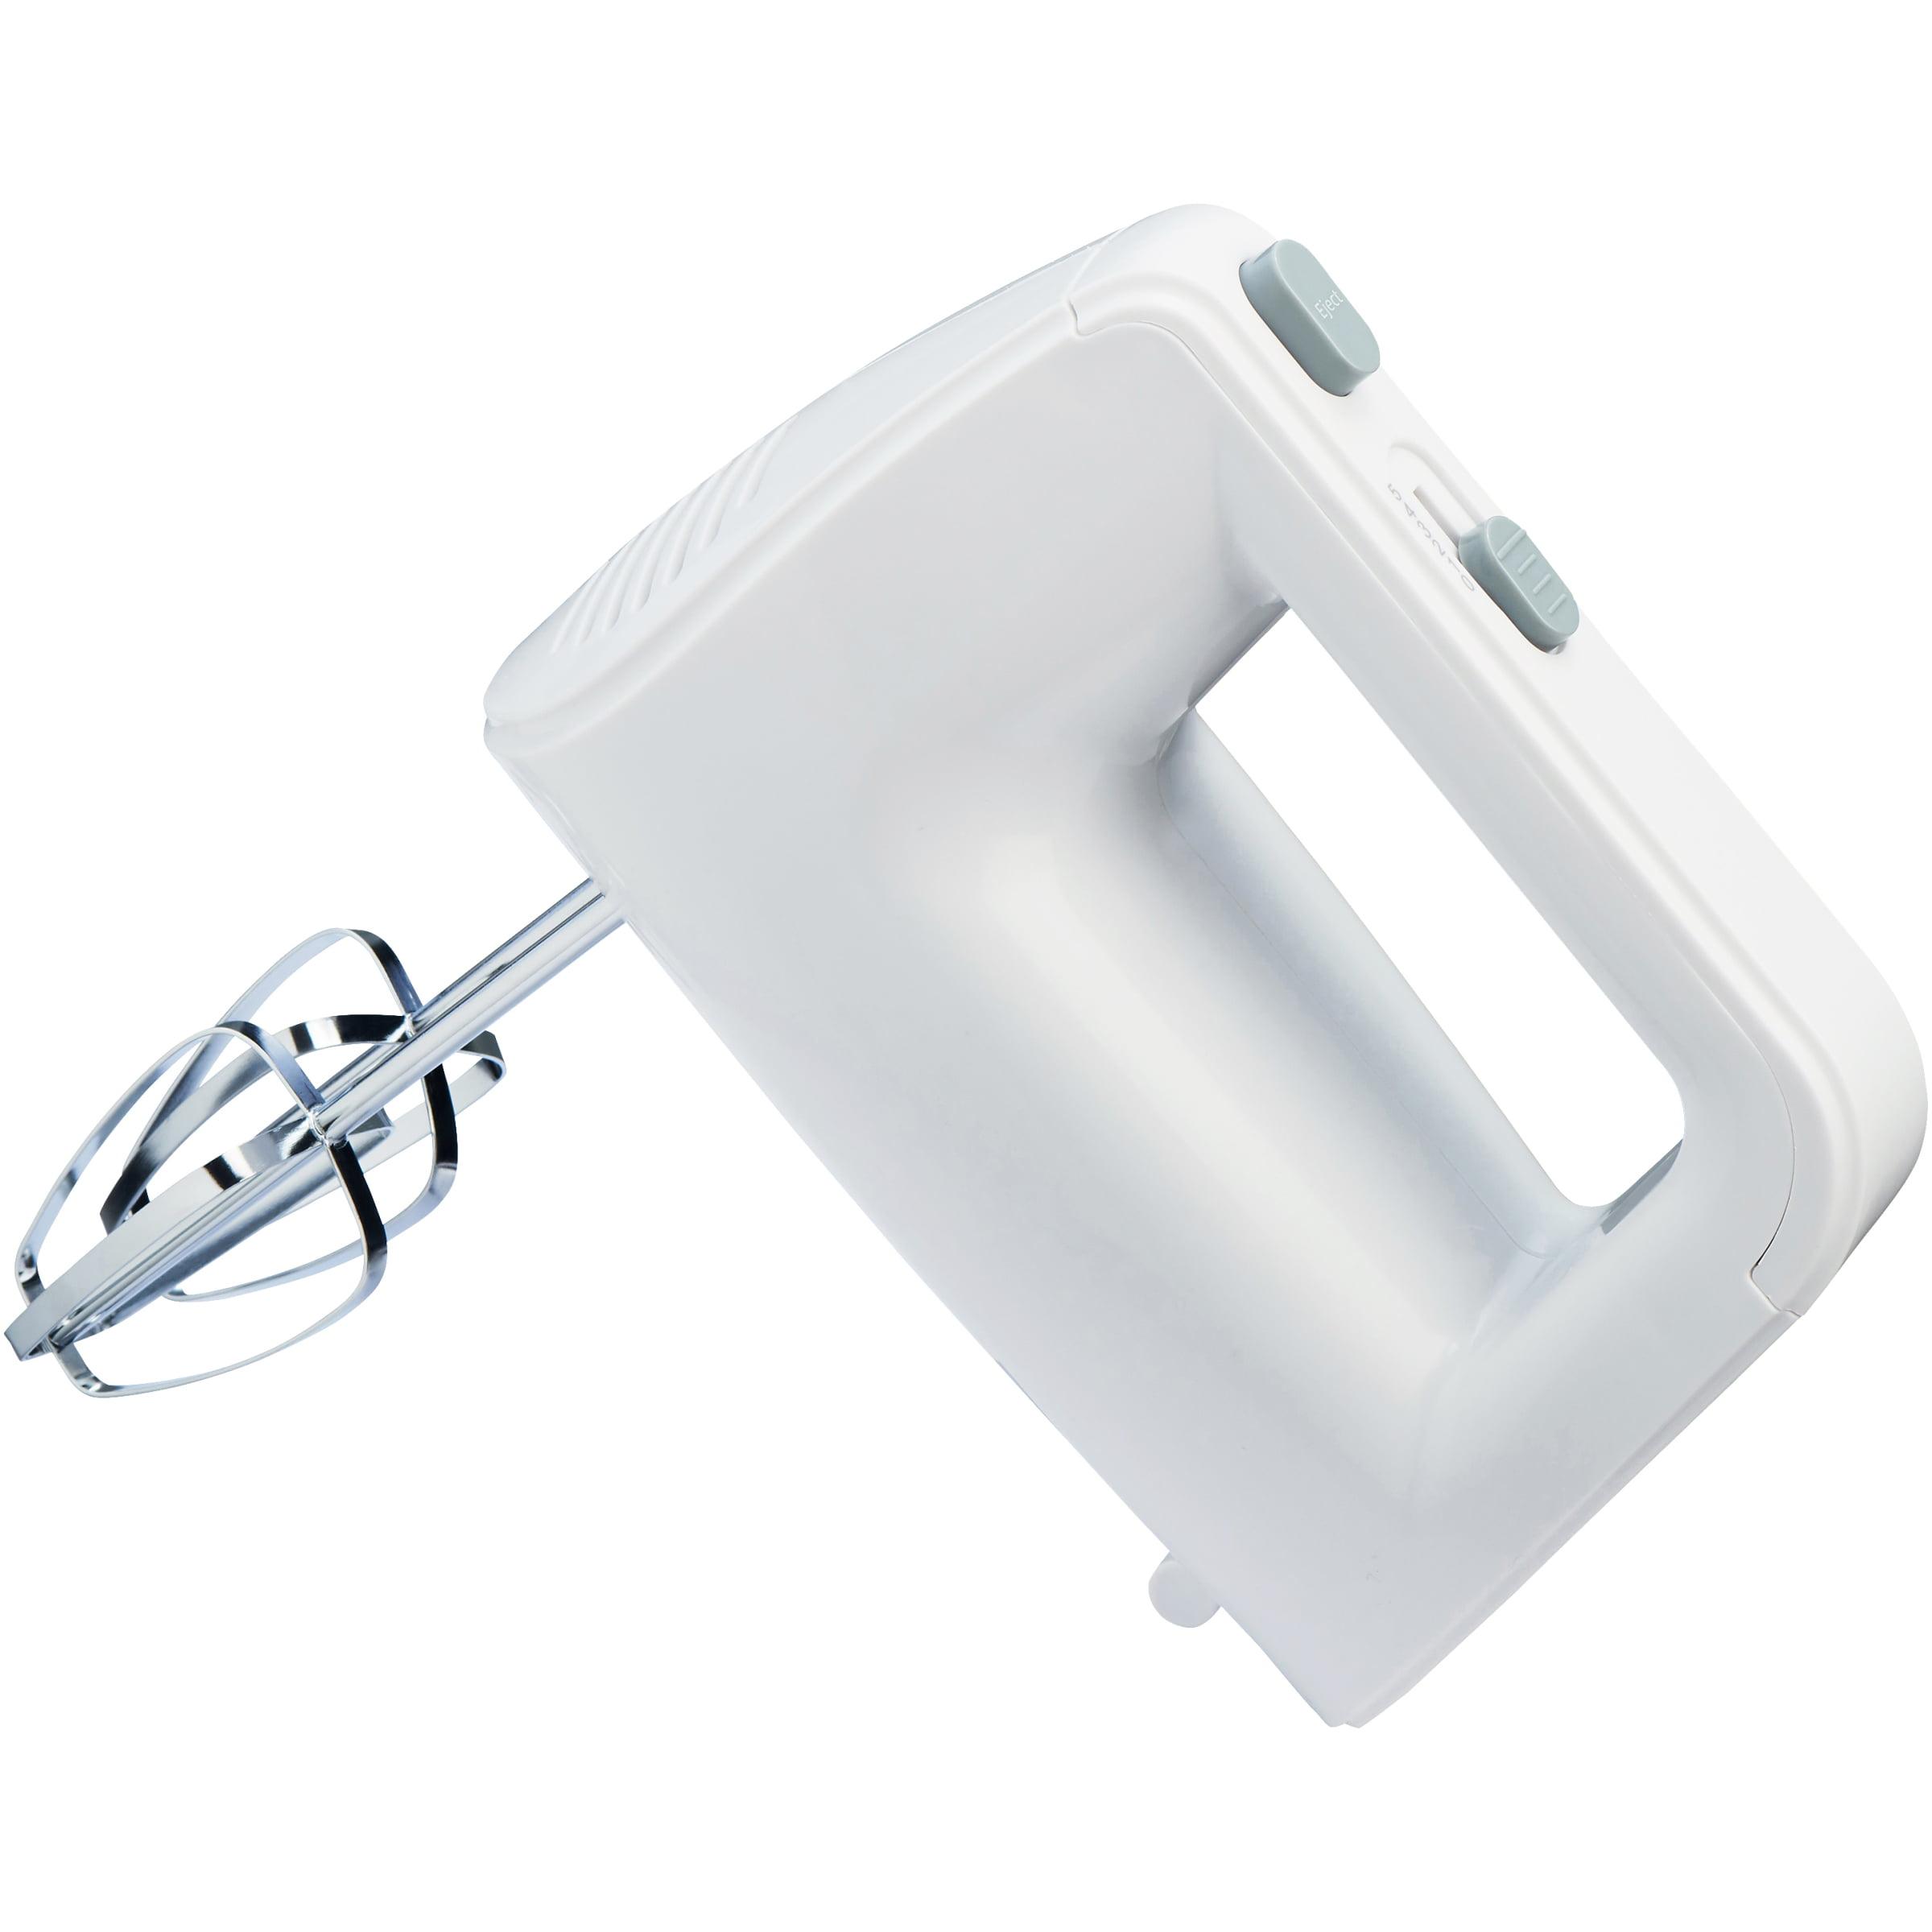 Mainstays 5-Speed 150-Watts Hand Mixer with Chrome Beaters, White